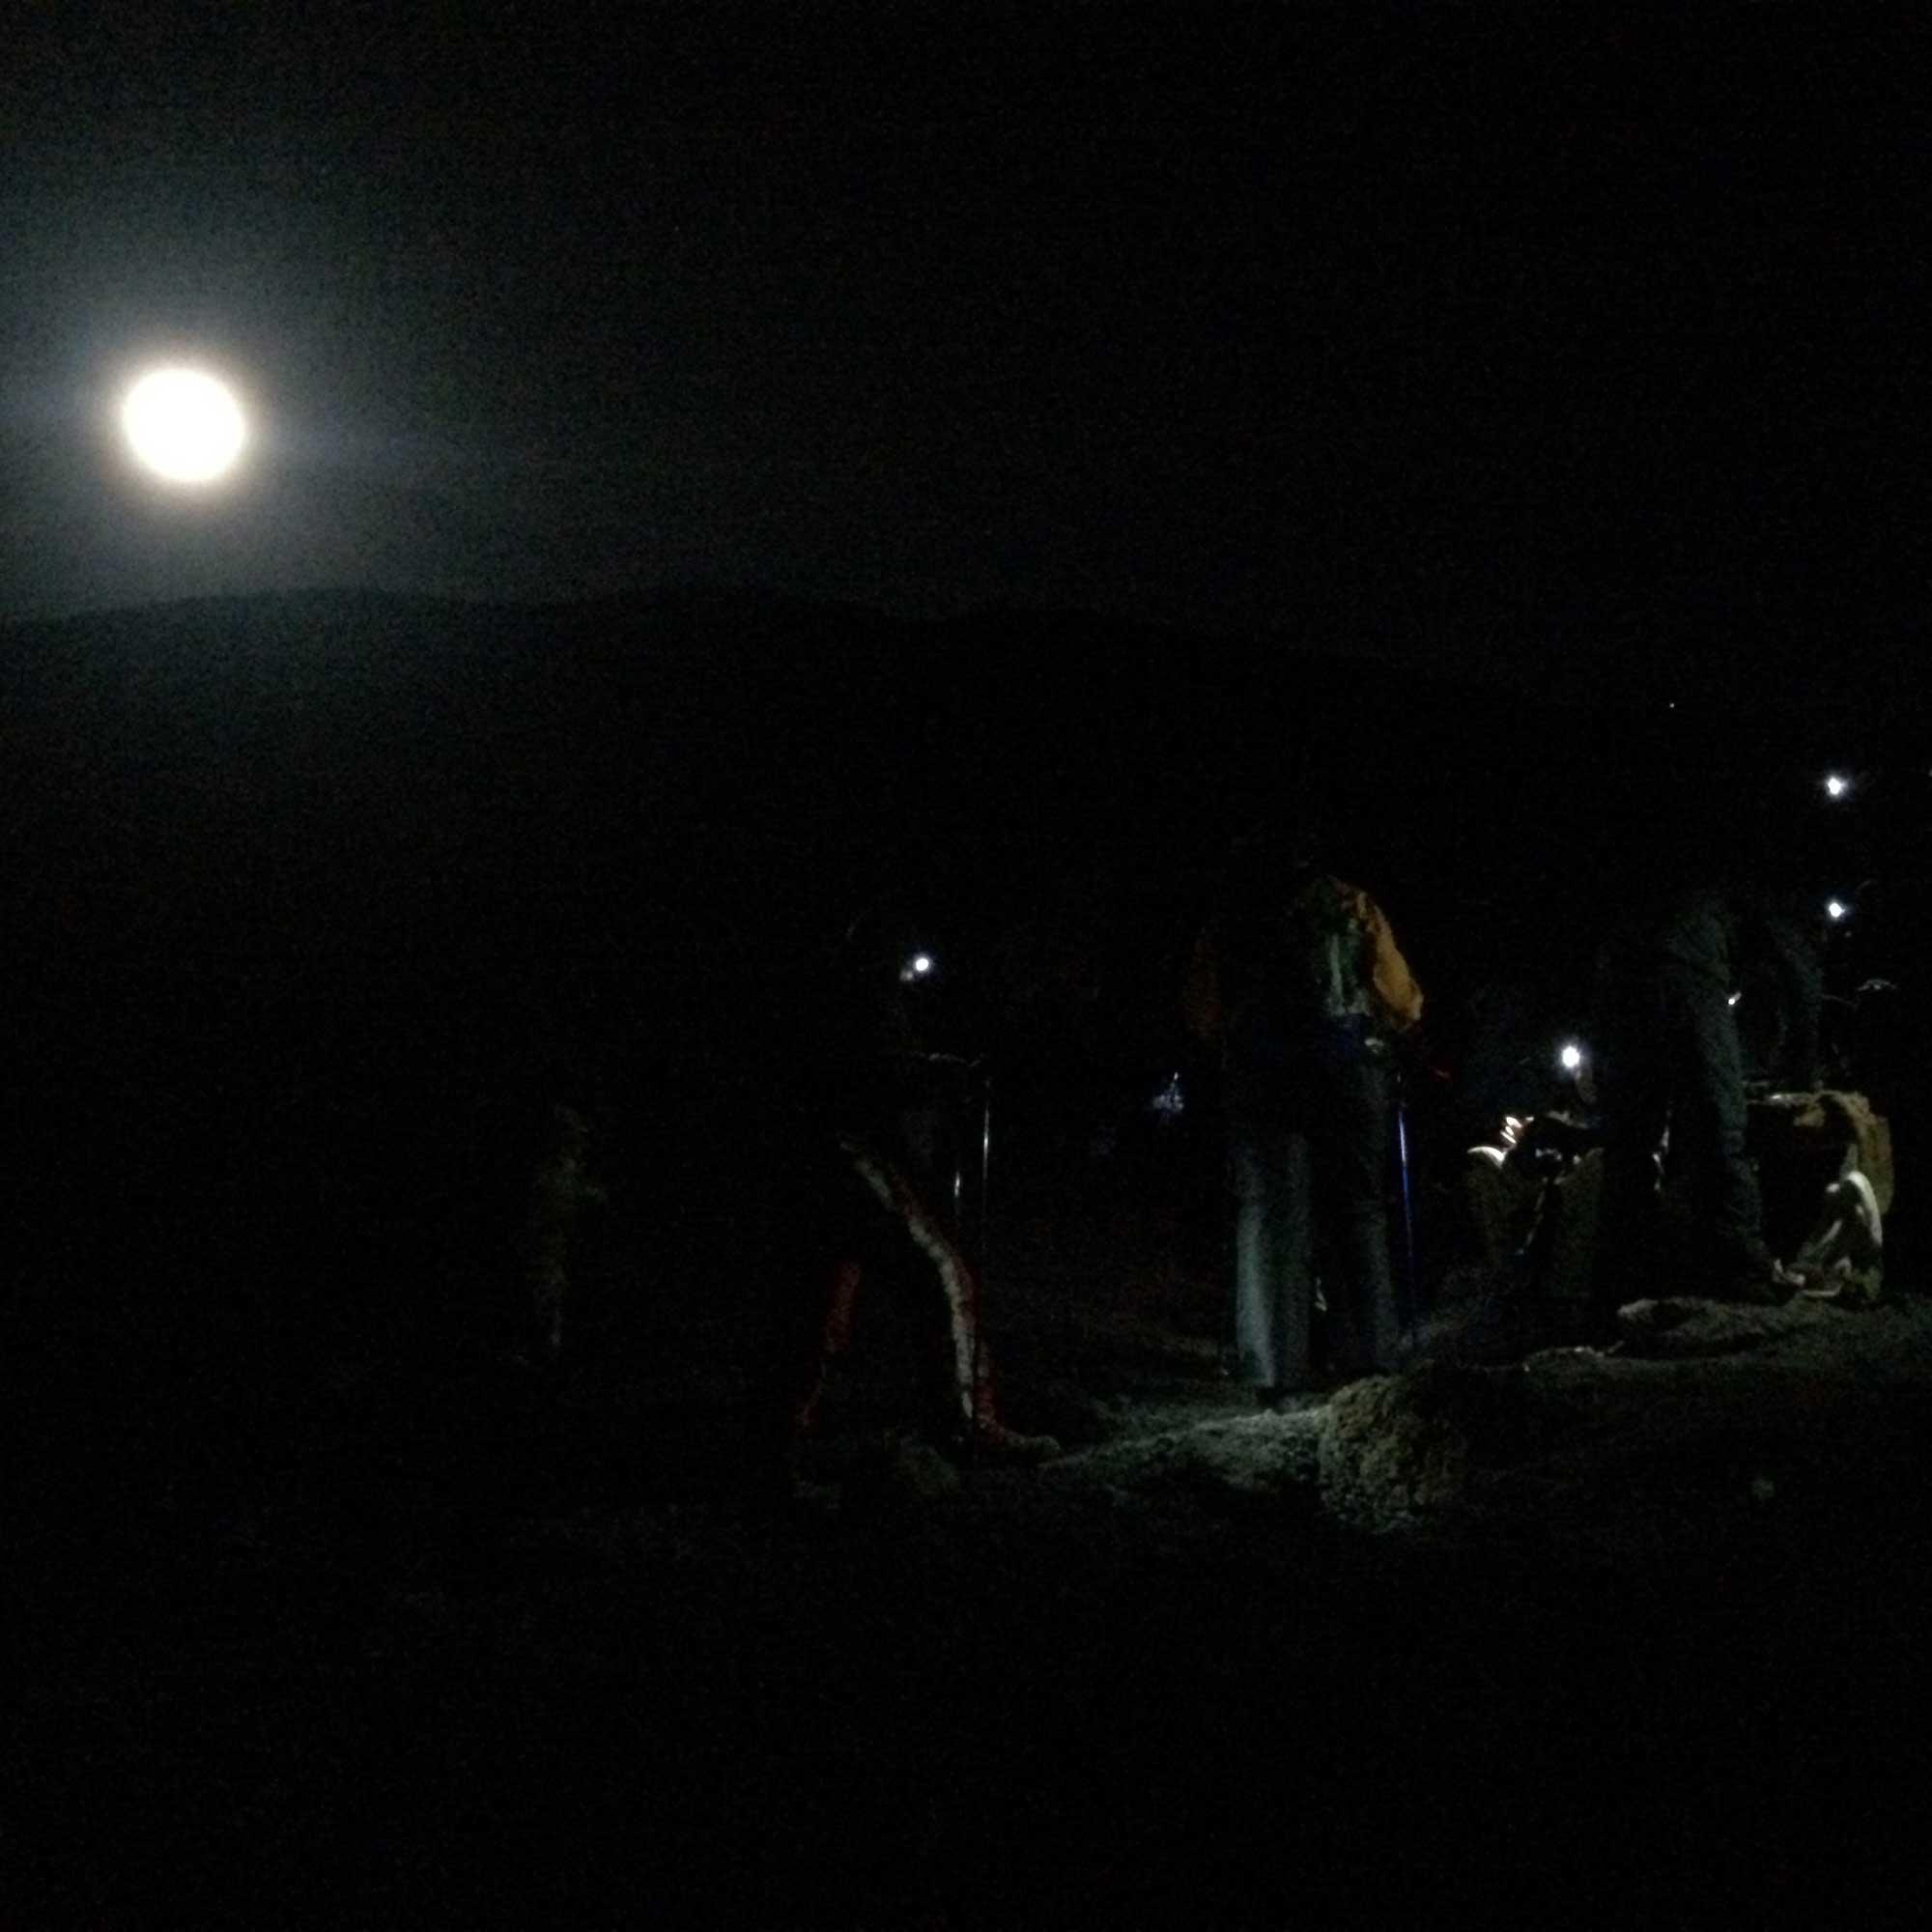 Kilimanjaro climbers taking a tea break in the dark on the summit push.